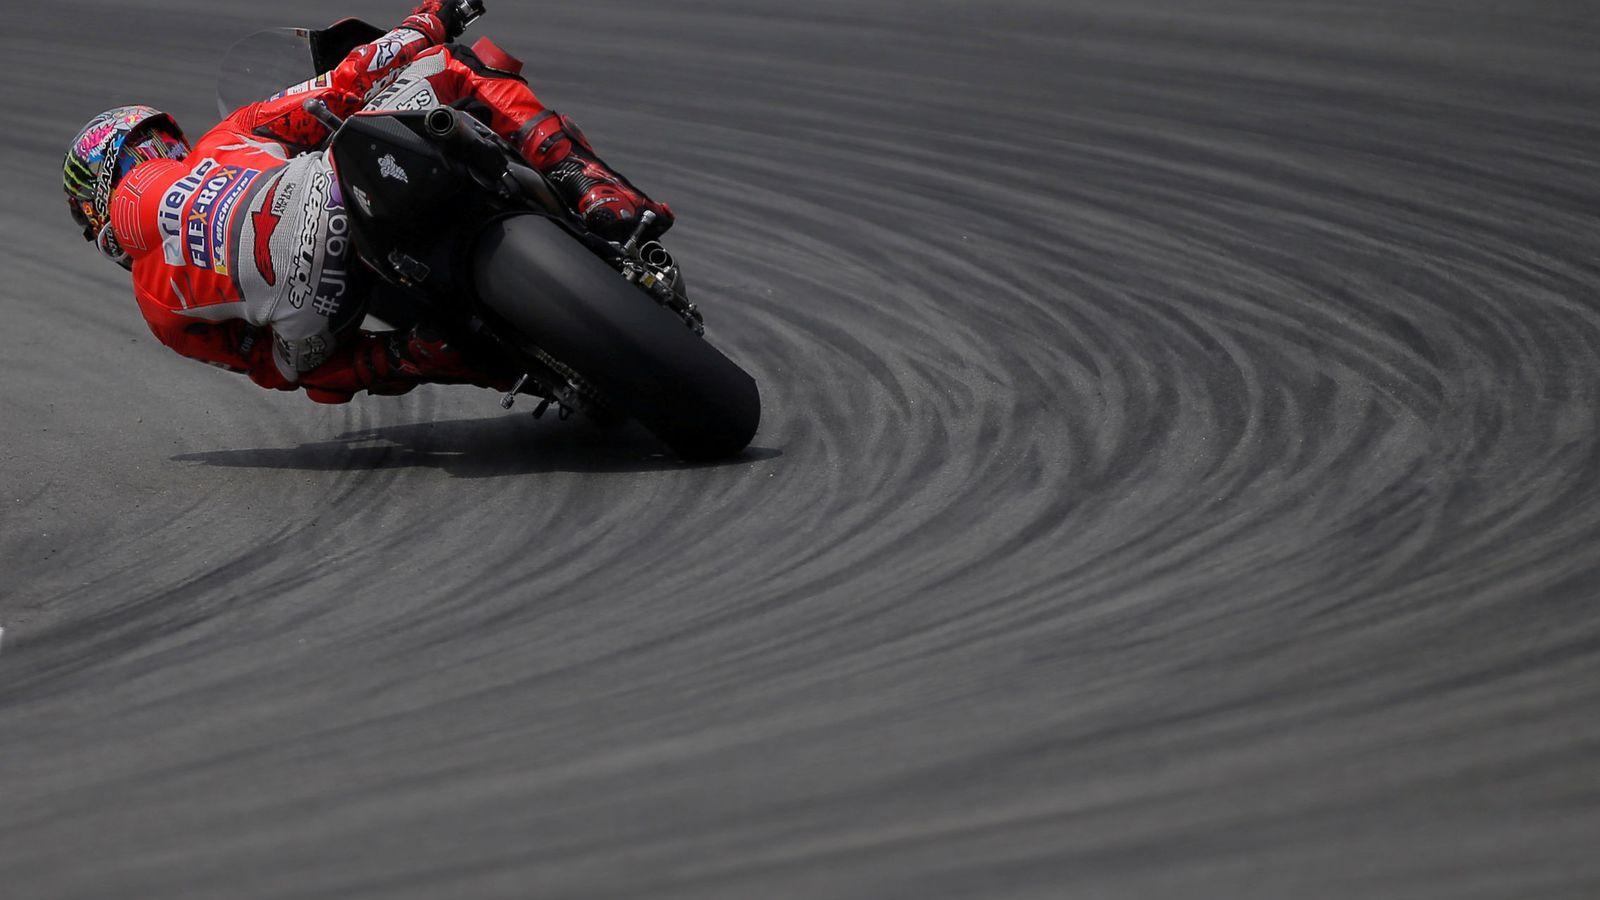 Foto: Jorge Lorenzo durante el GP de Catalunya. (Reuters)